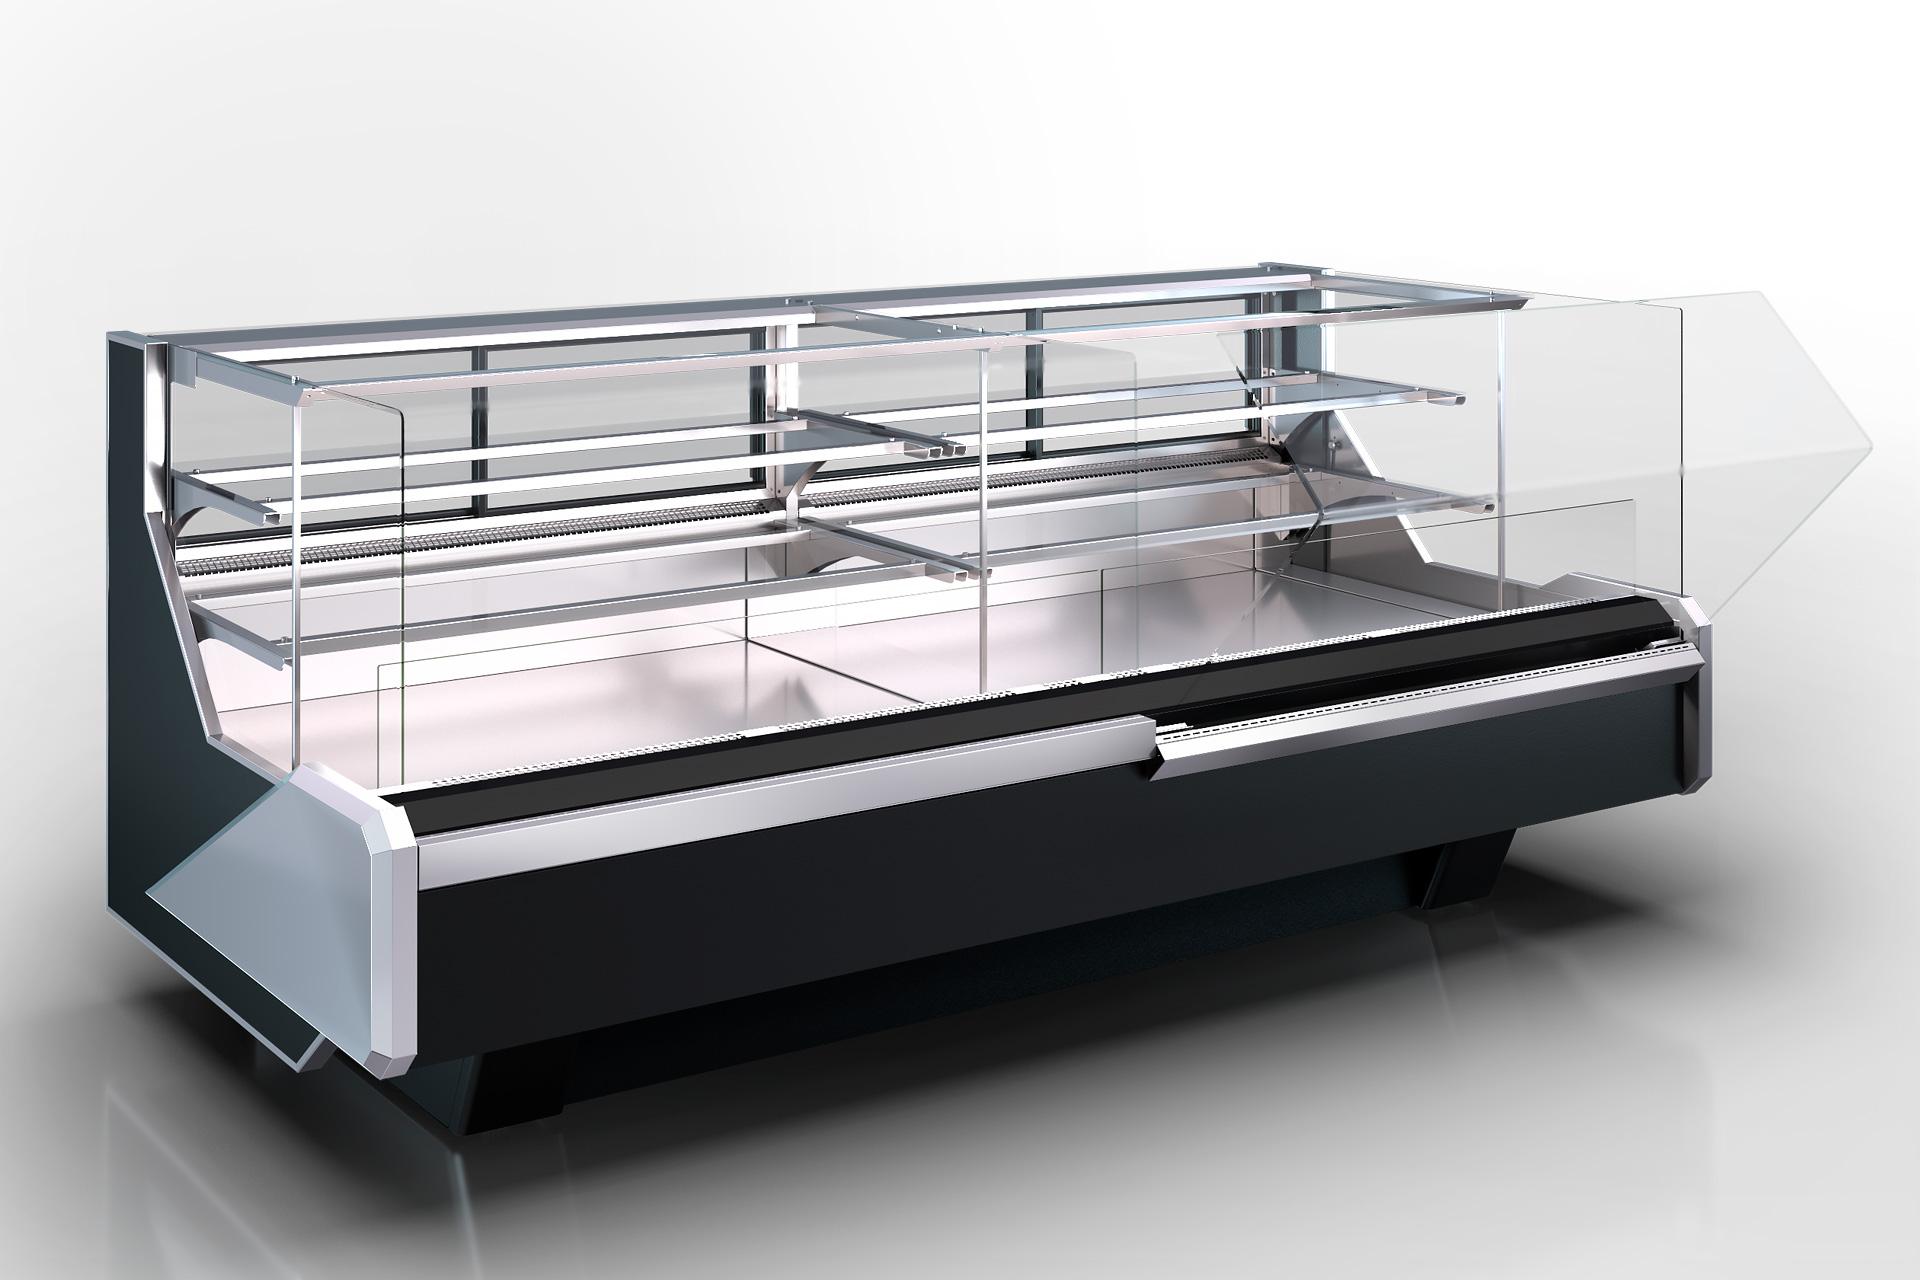 Холодильная витрина Missouri enigma MC 122 patisserie OS 115-DLM